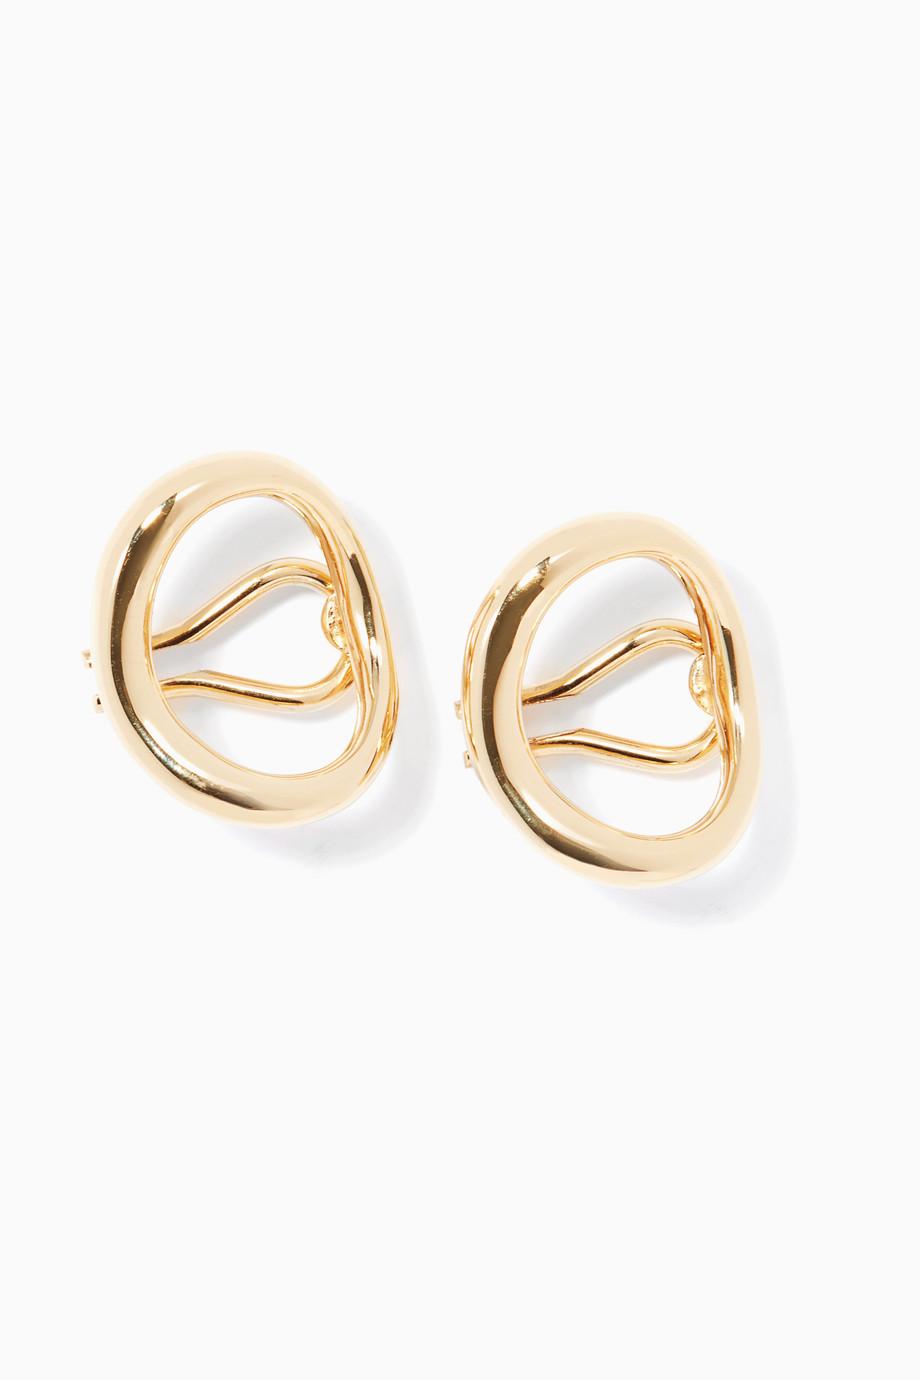 a211c16da Shop Charlotte Chesnais Gold Gold Naho Clip Earrings for Women ...